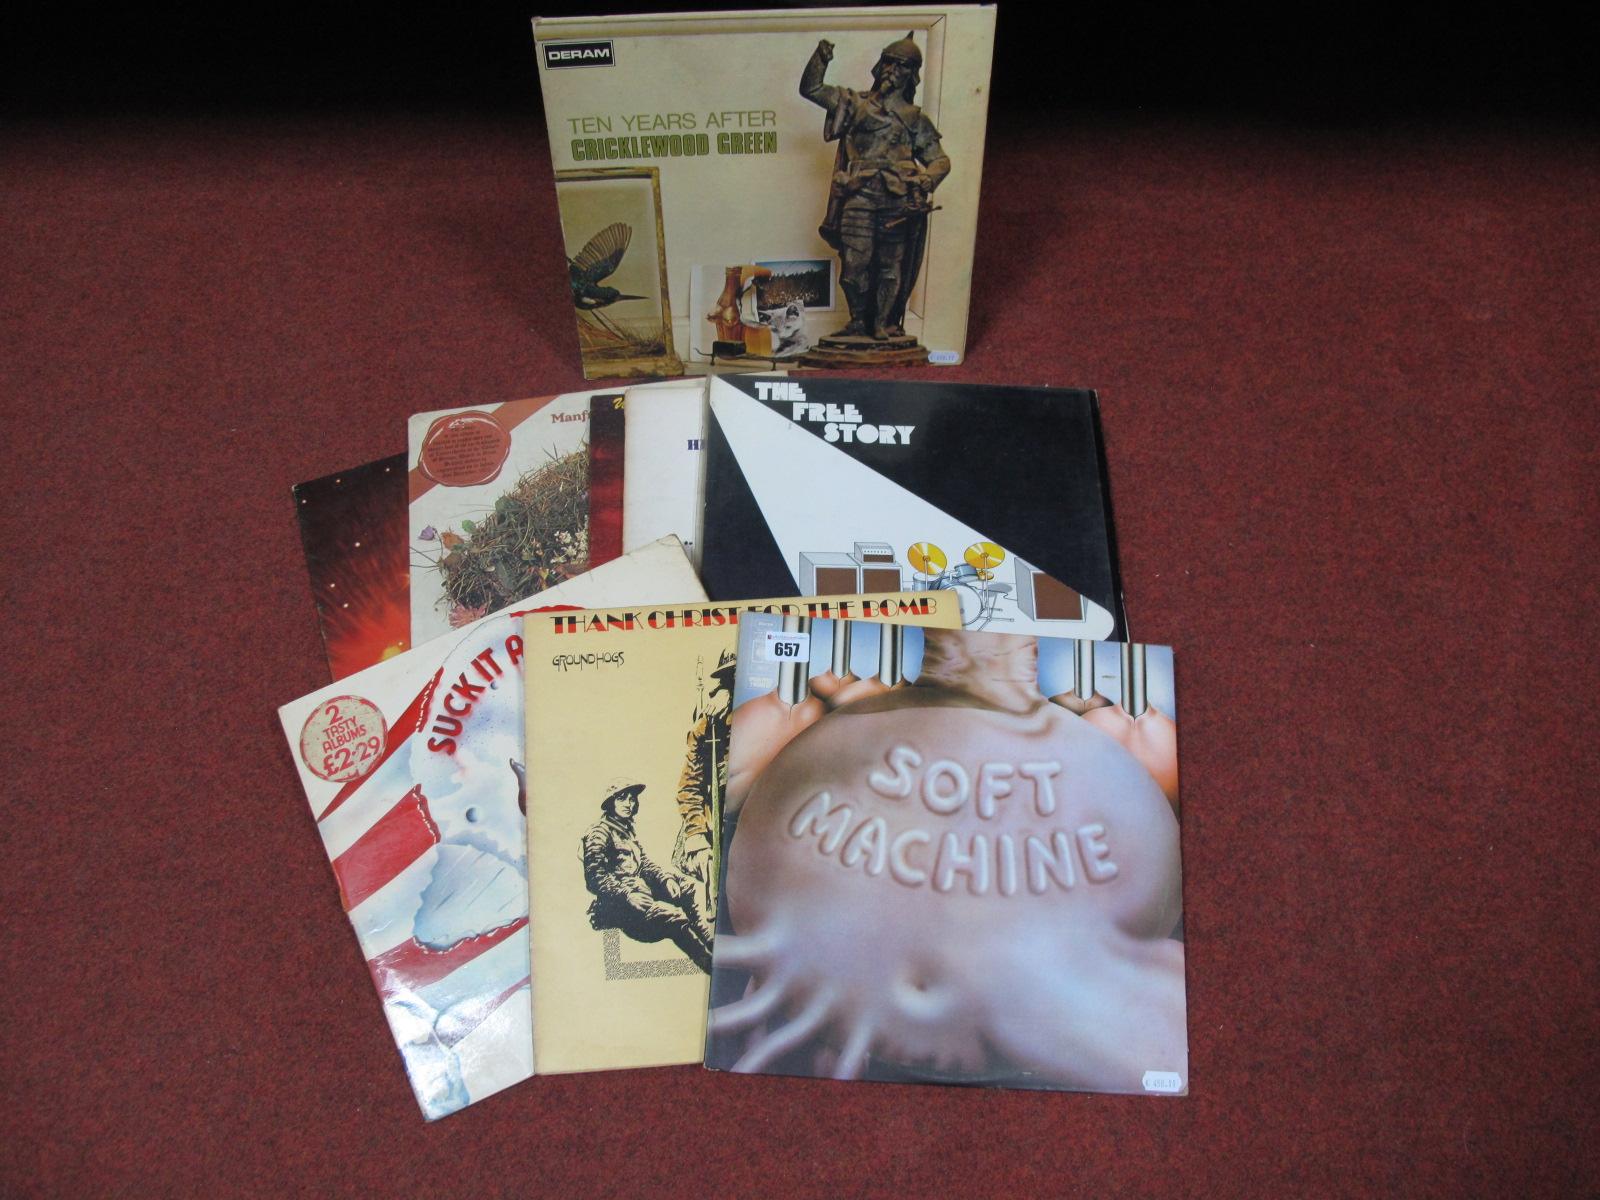 Lot 657 - Prog/Rock LP's - Soft Machine 'Six', Ten Years After 'Cricklewood Green' (Deram, stereo SML 1065